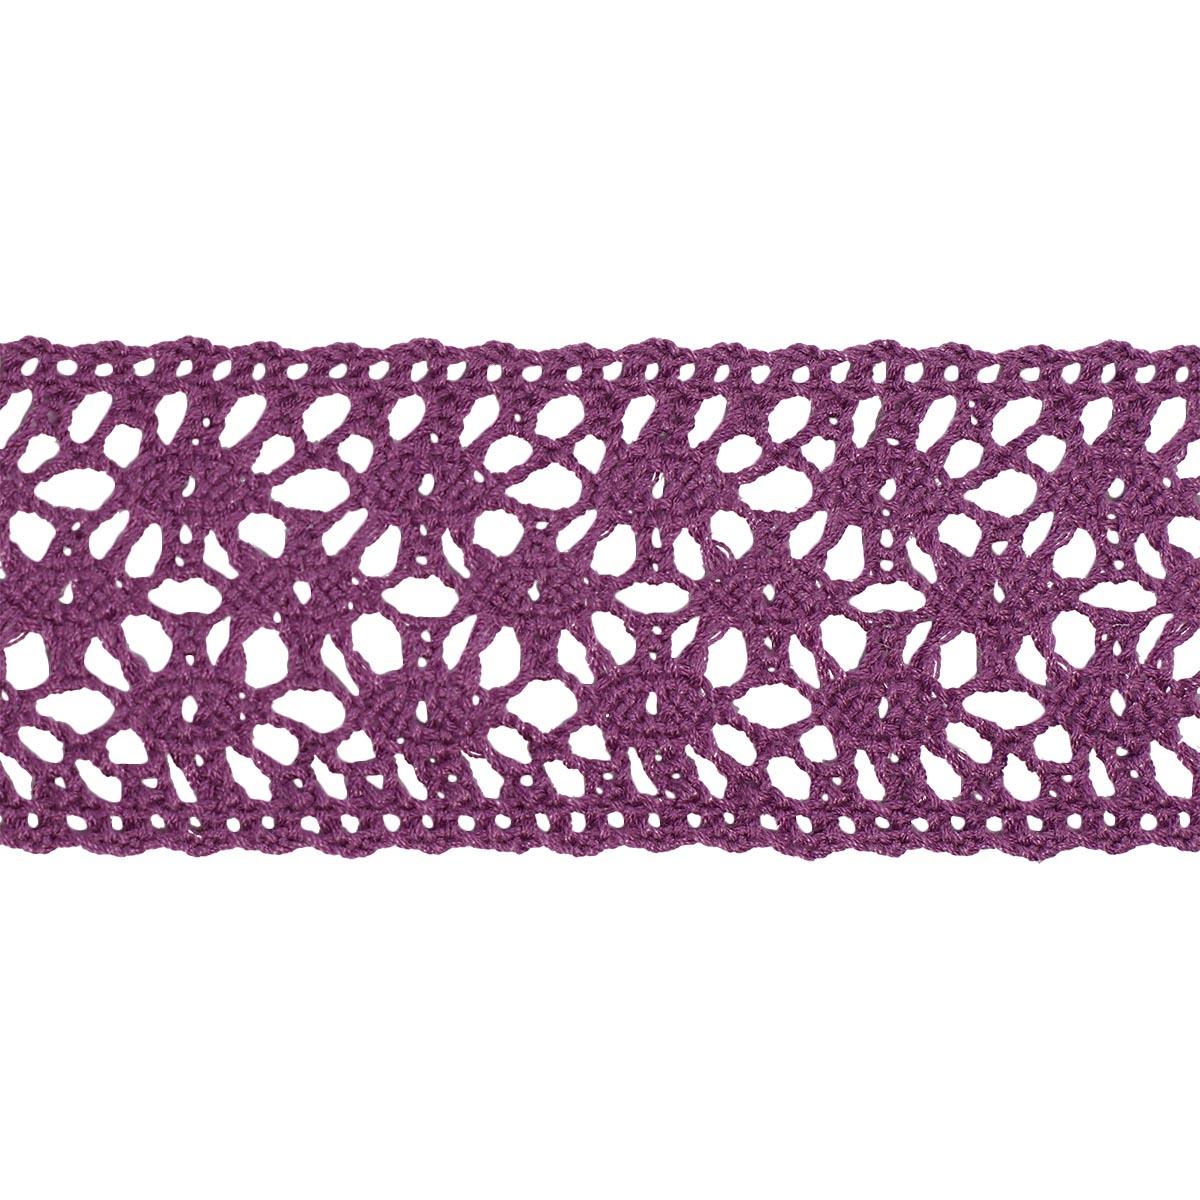 50-6422/013/ Тесьма вязаная ажур 38мм*25м двухстор.